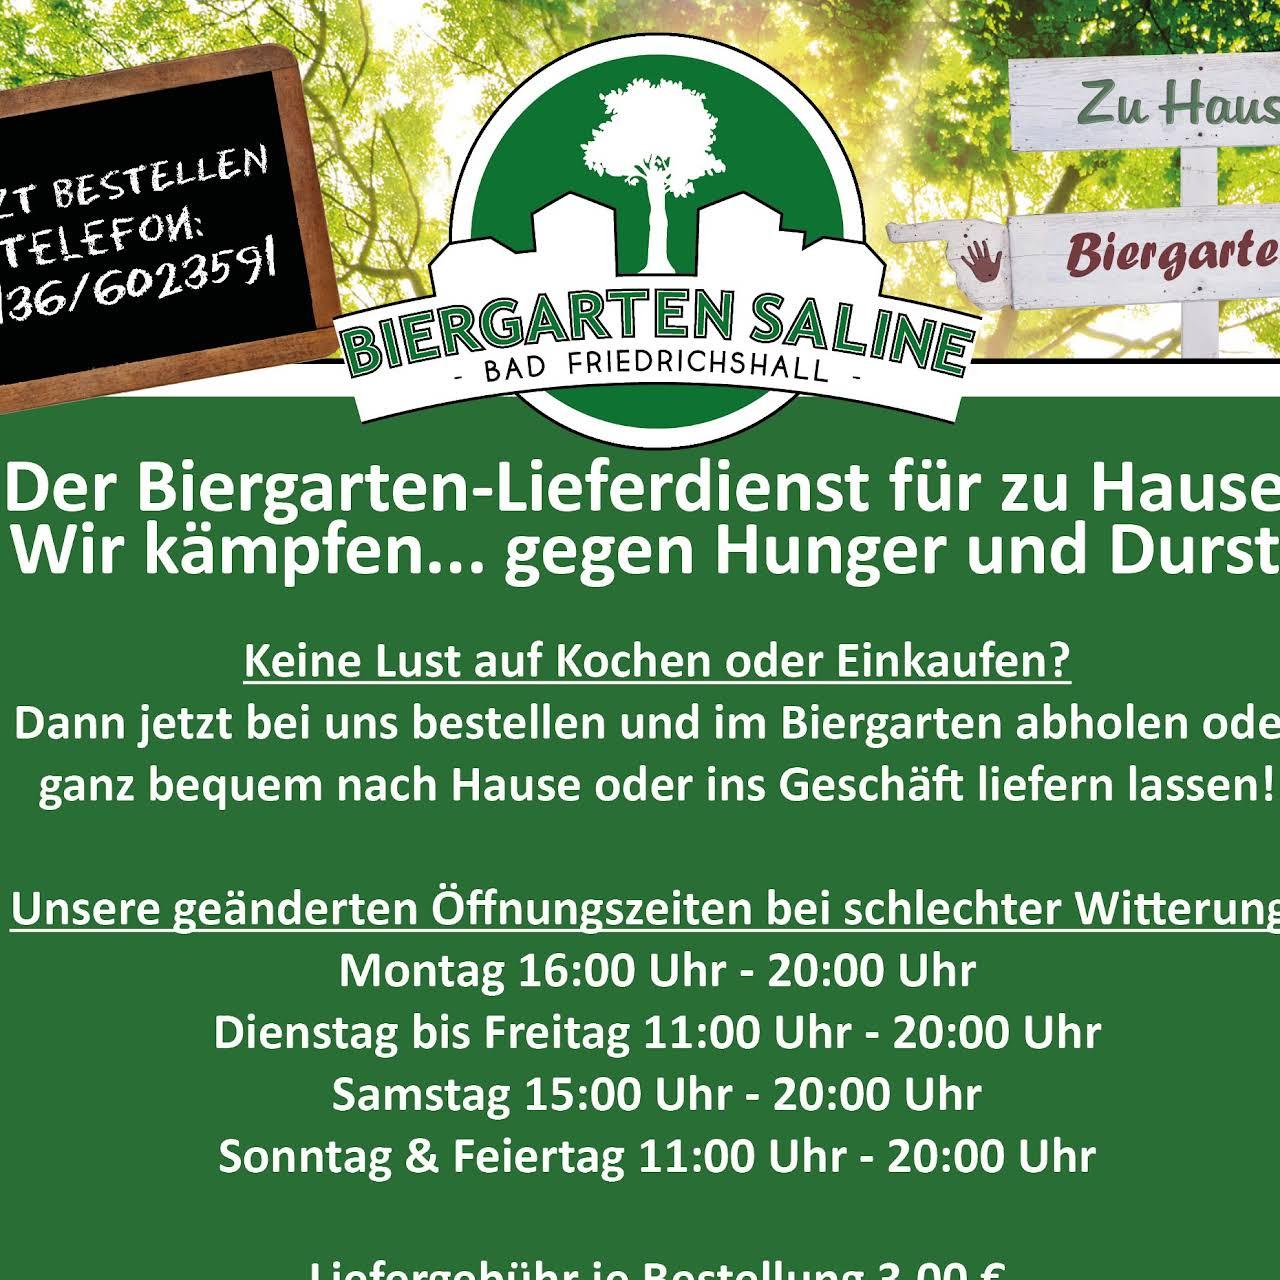 Biergarten Saline Wintergarten Saline Biergarten In Bad Friedrichshall